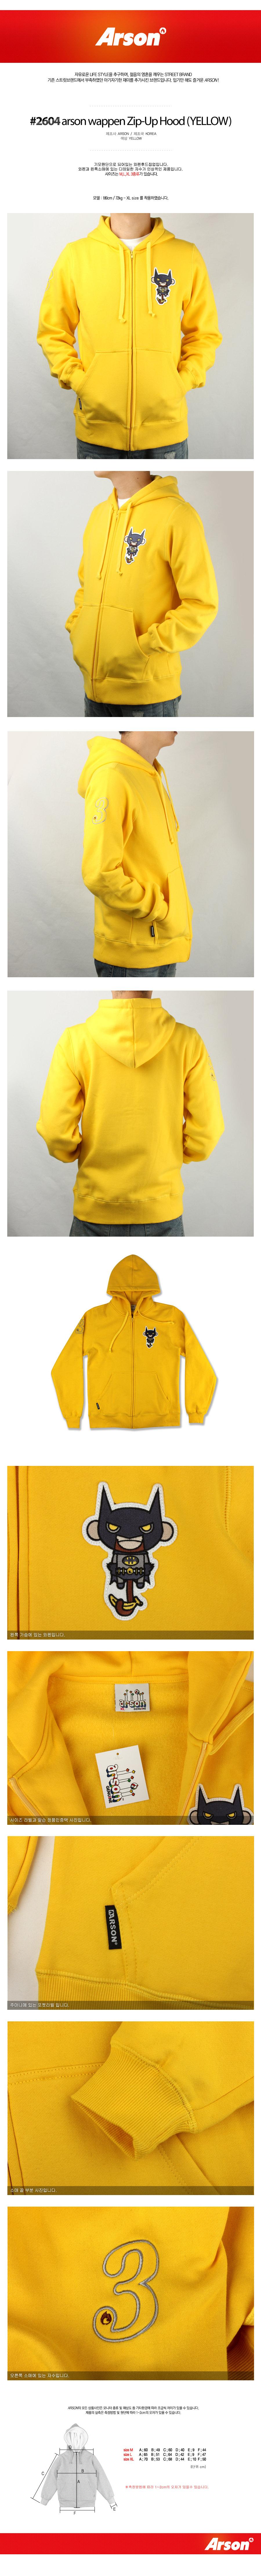 [ ARSON ] [ARSON] J2604 arson HOOD TEE zip up hoodie